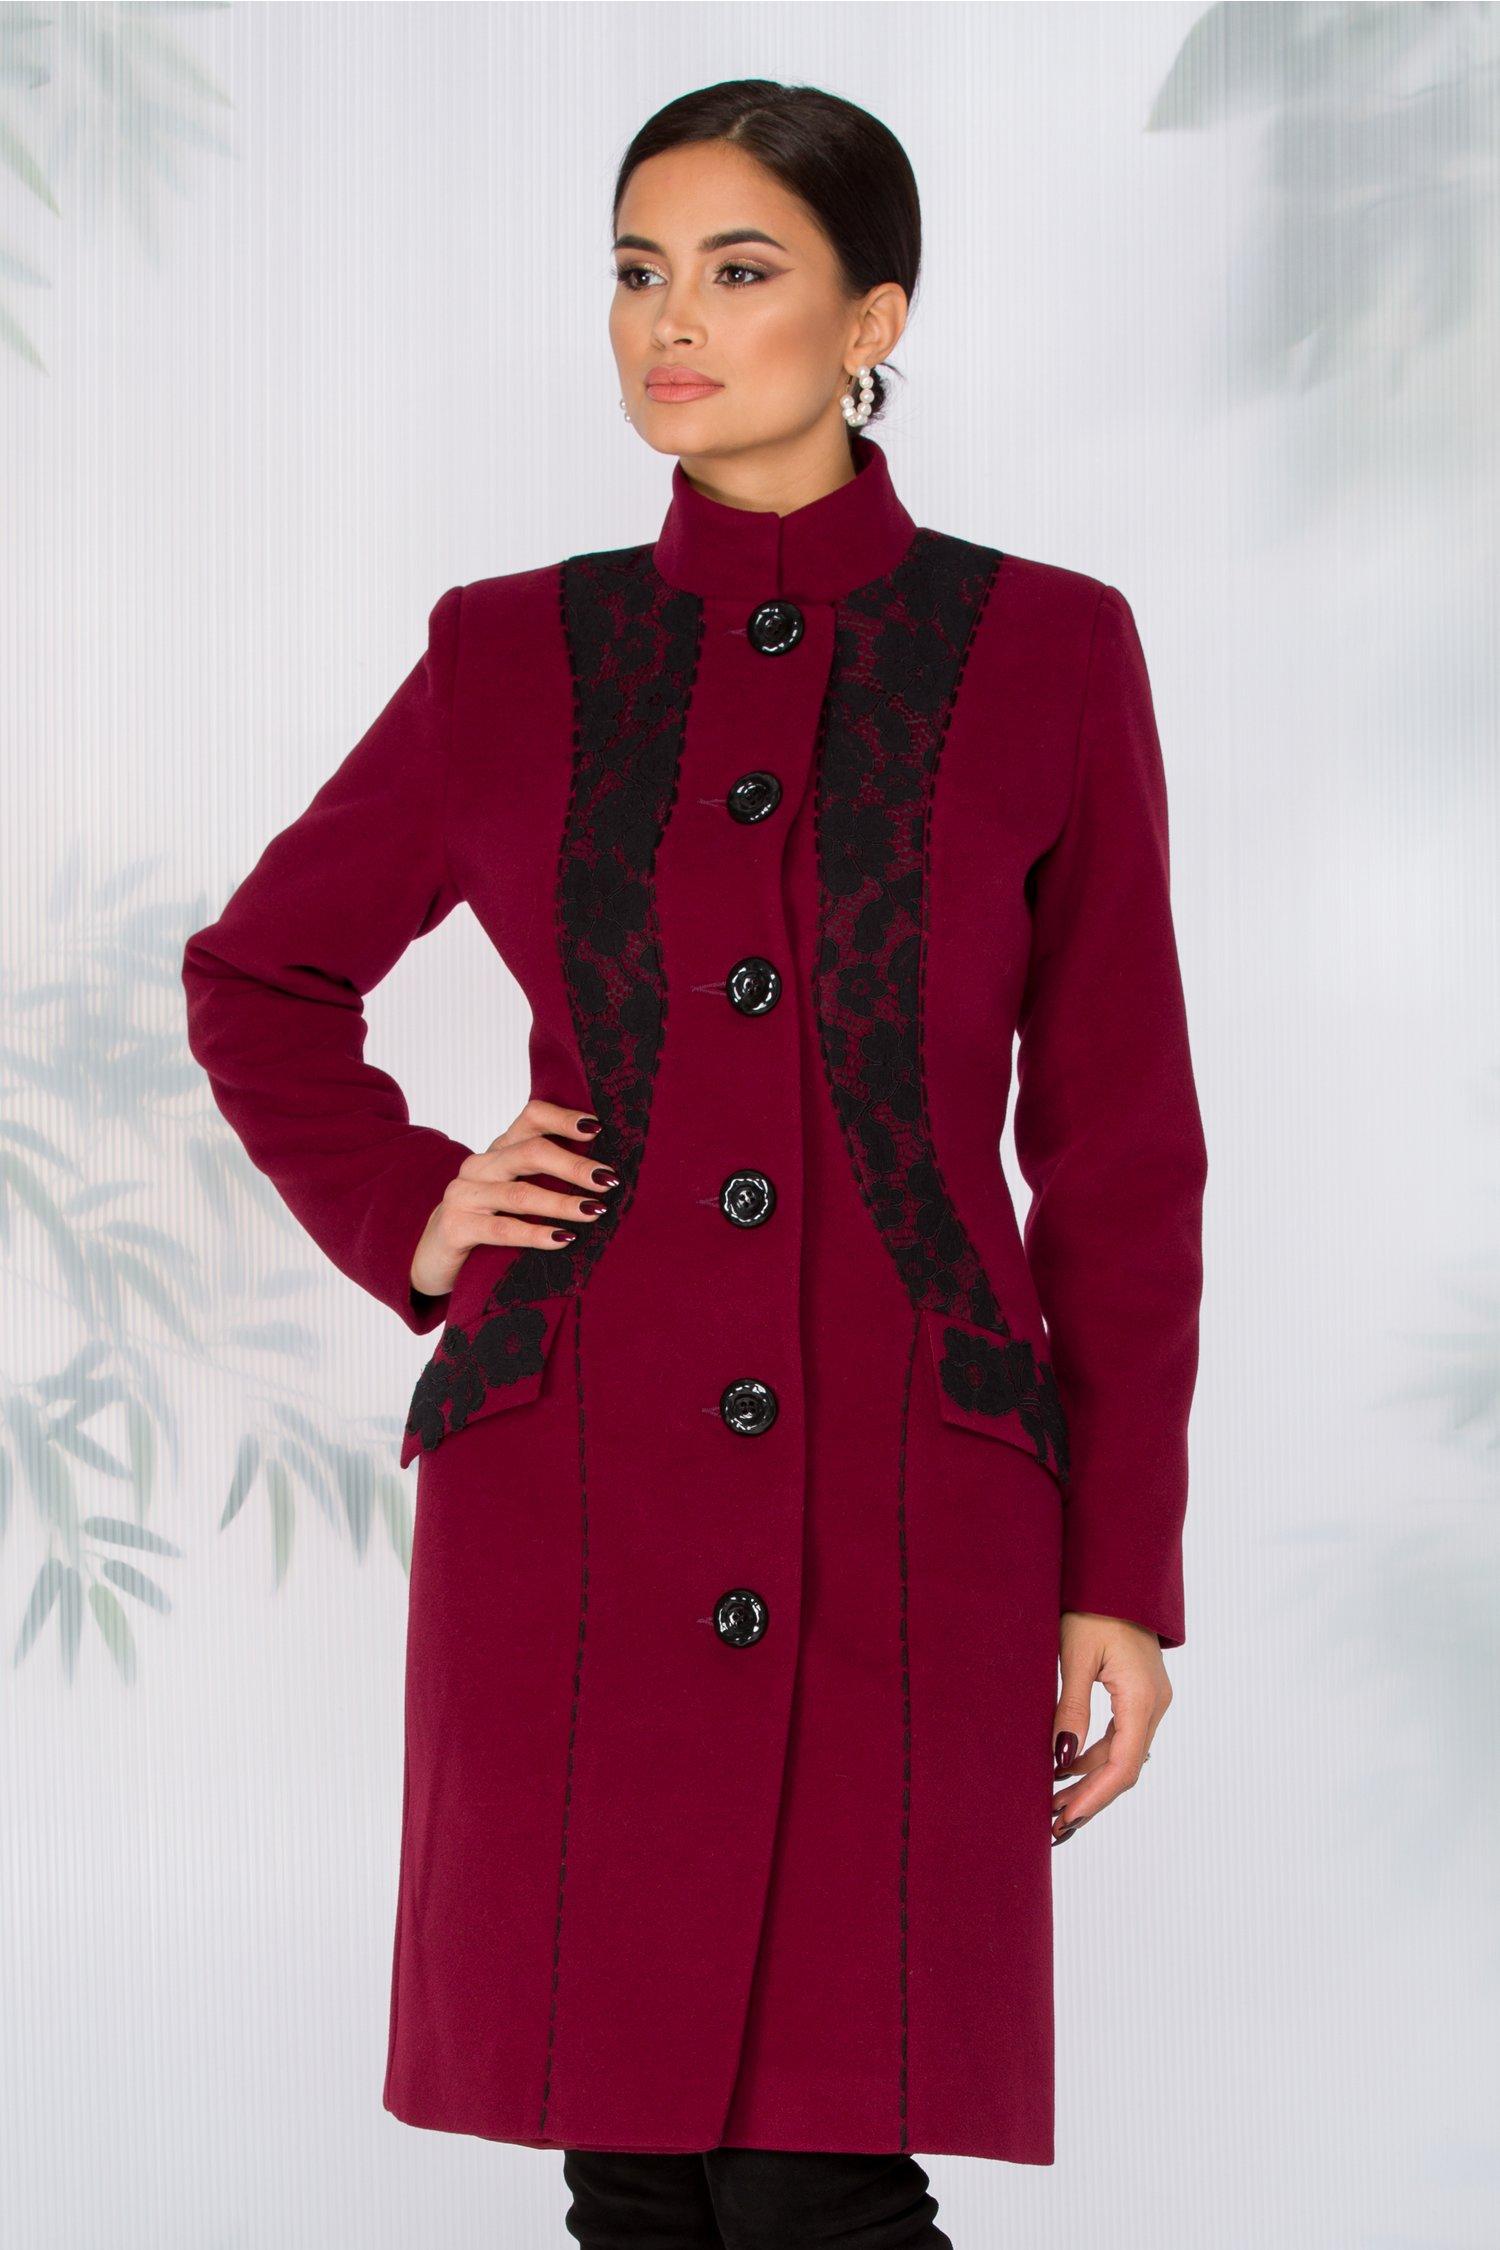 Palton LaDonna bordo cu broderie neagra handmade